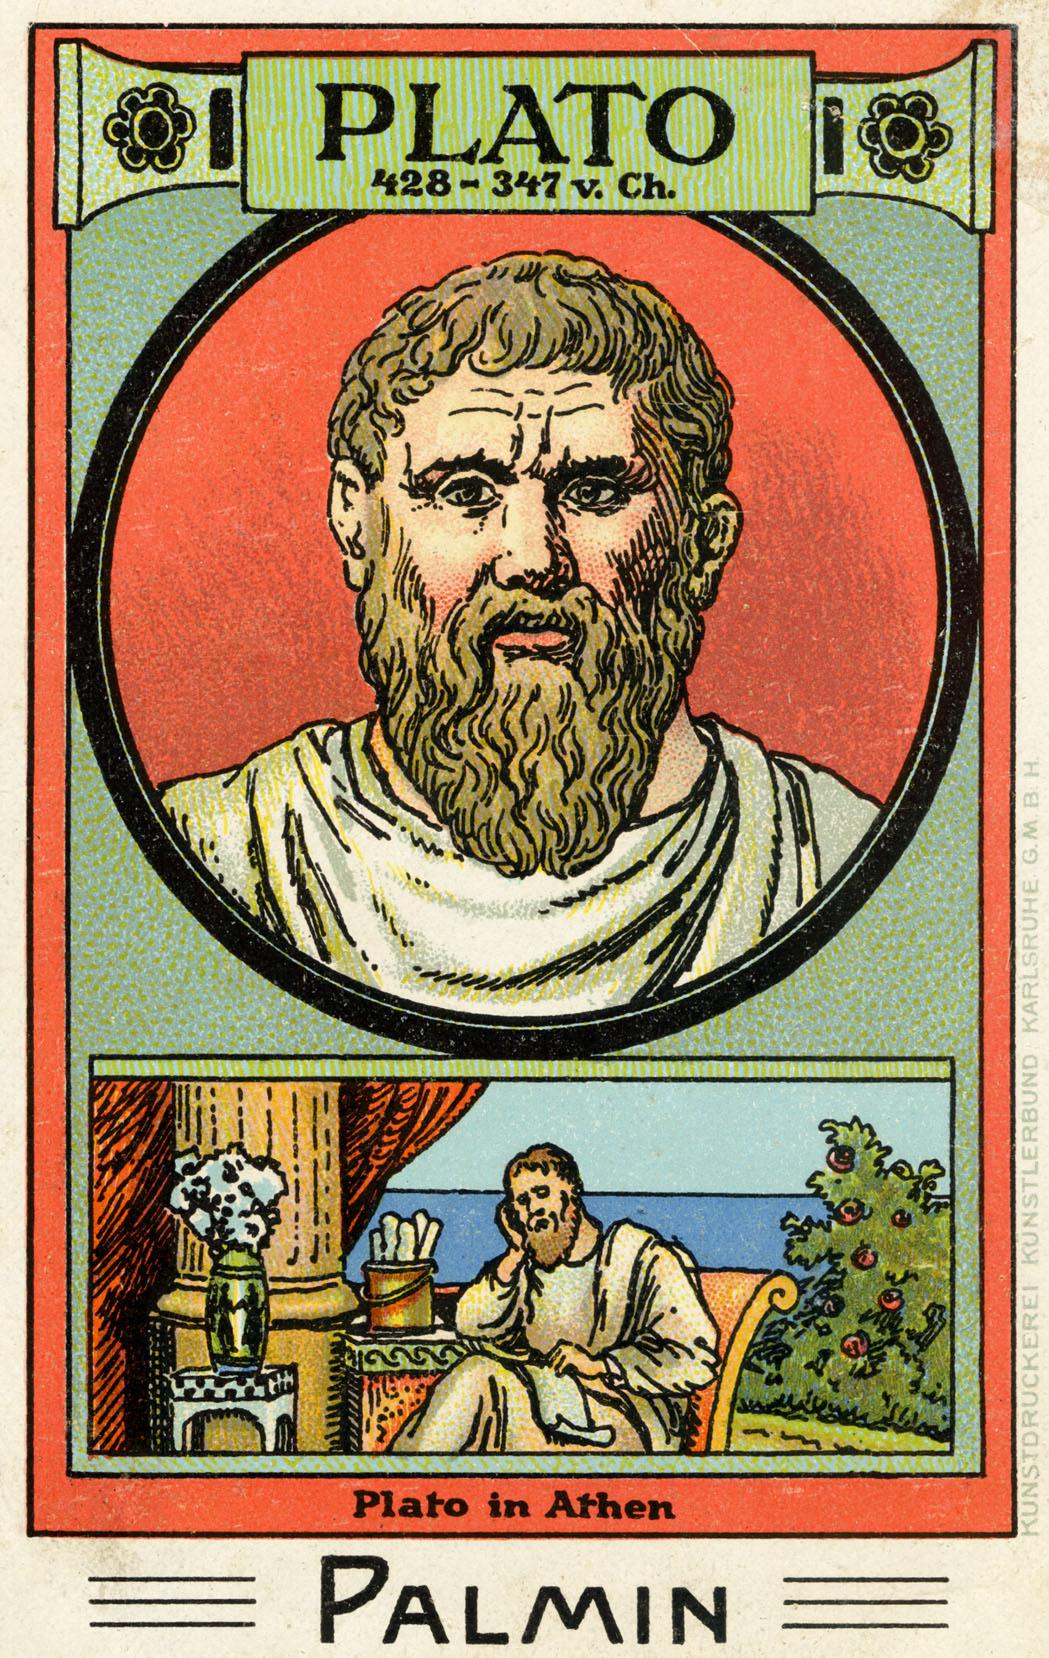 Plato - illustrated portrait. Greek philosopher, 428 - 347 AD.